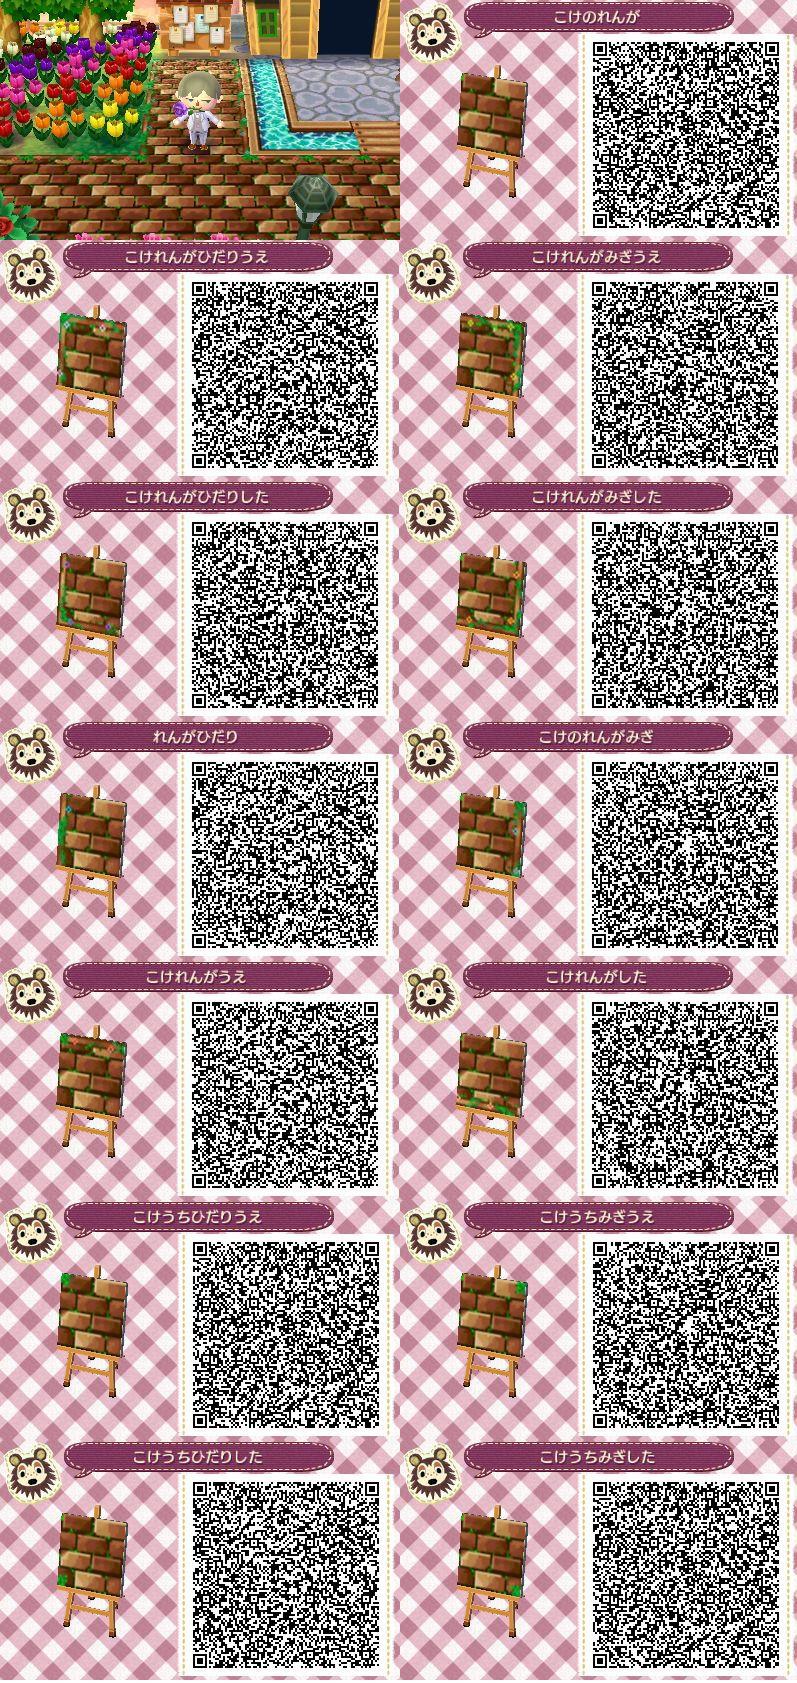 Brick Path Animal Crossing Animal Crossing 3ds Animal Crossing Qr